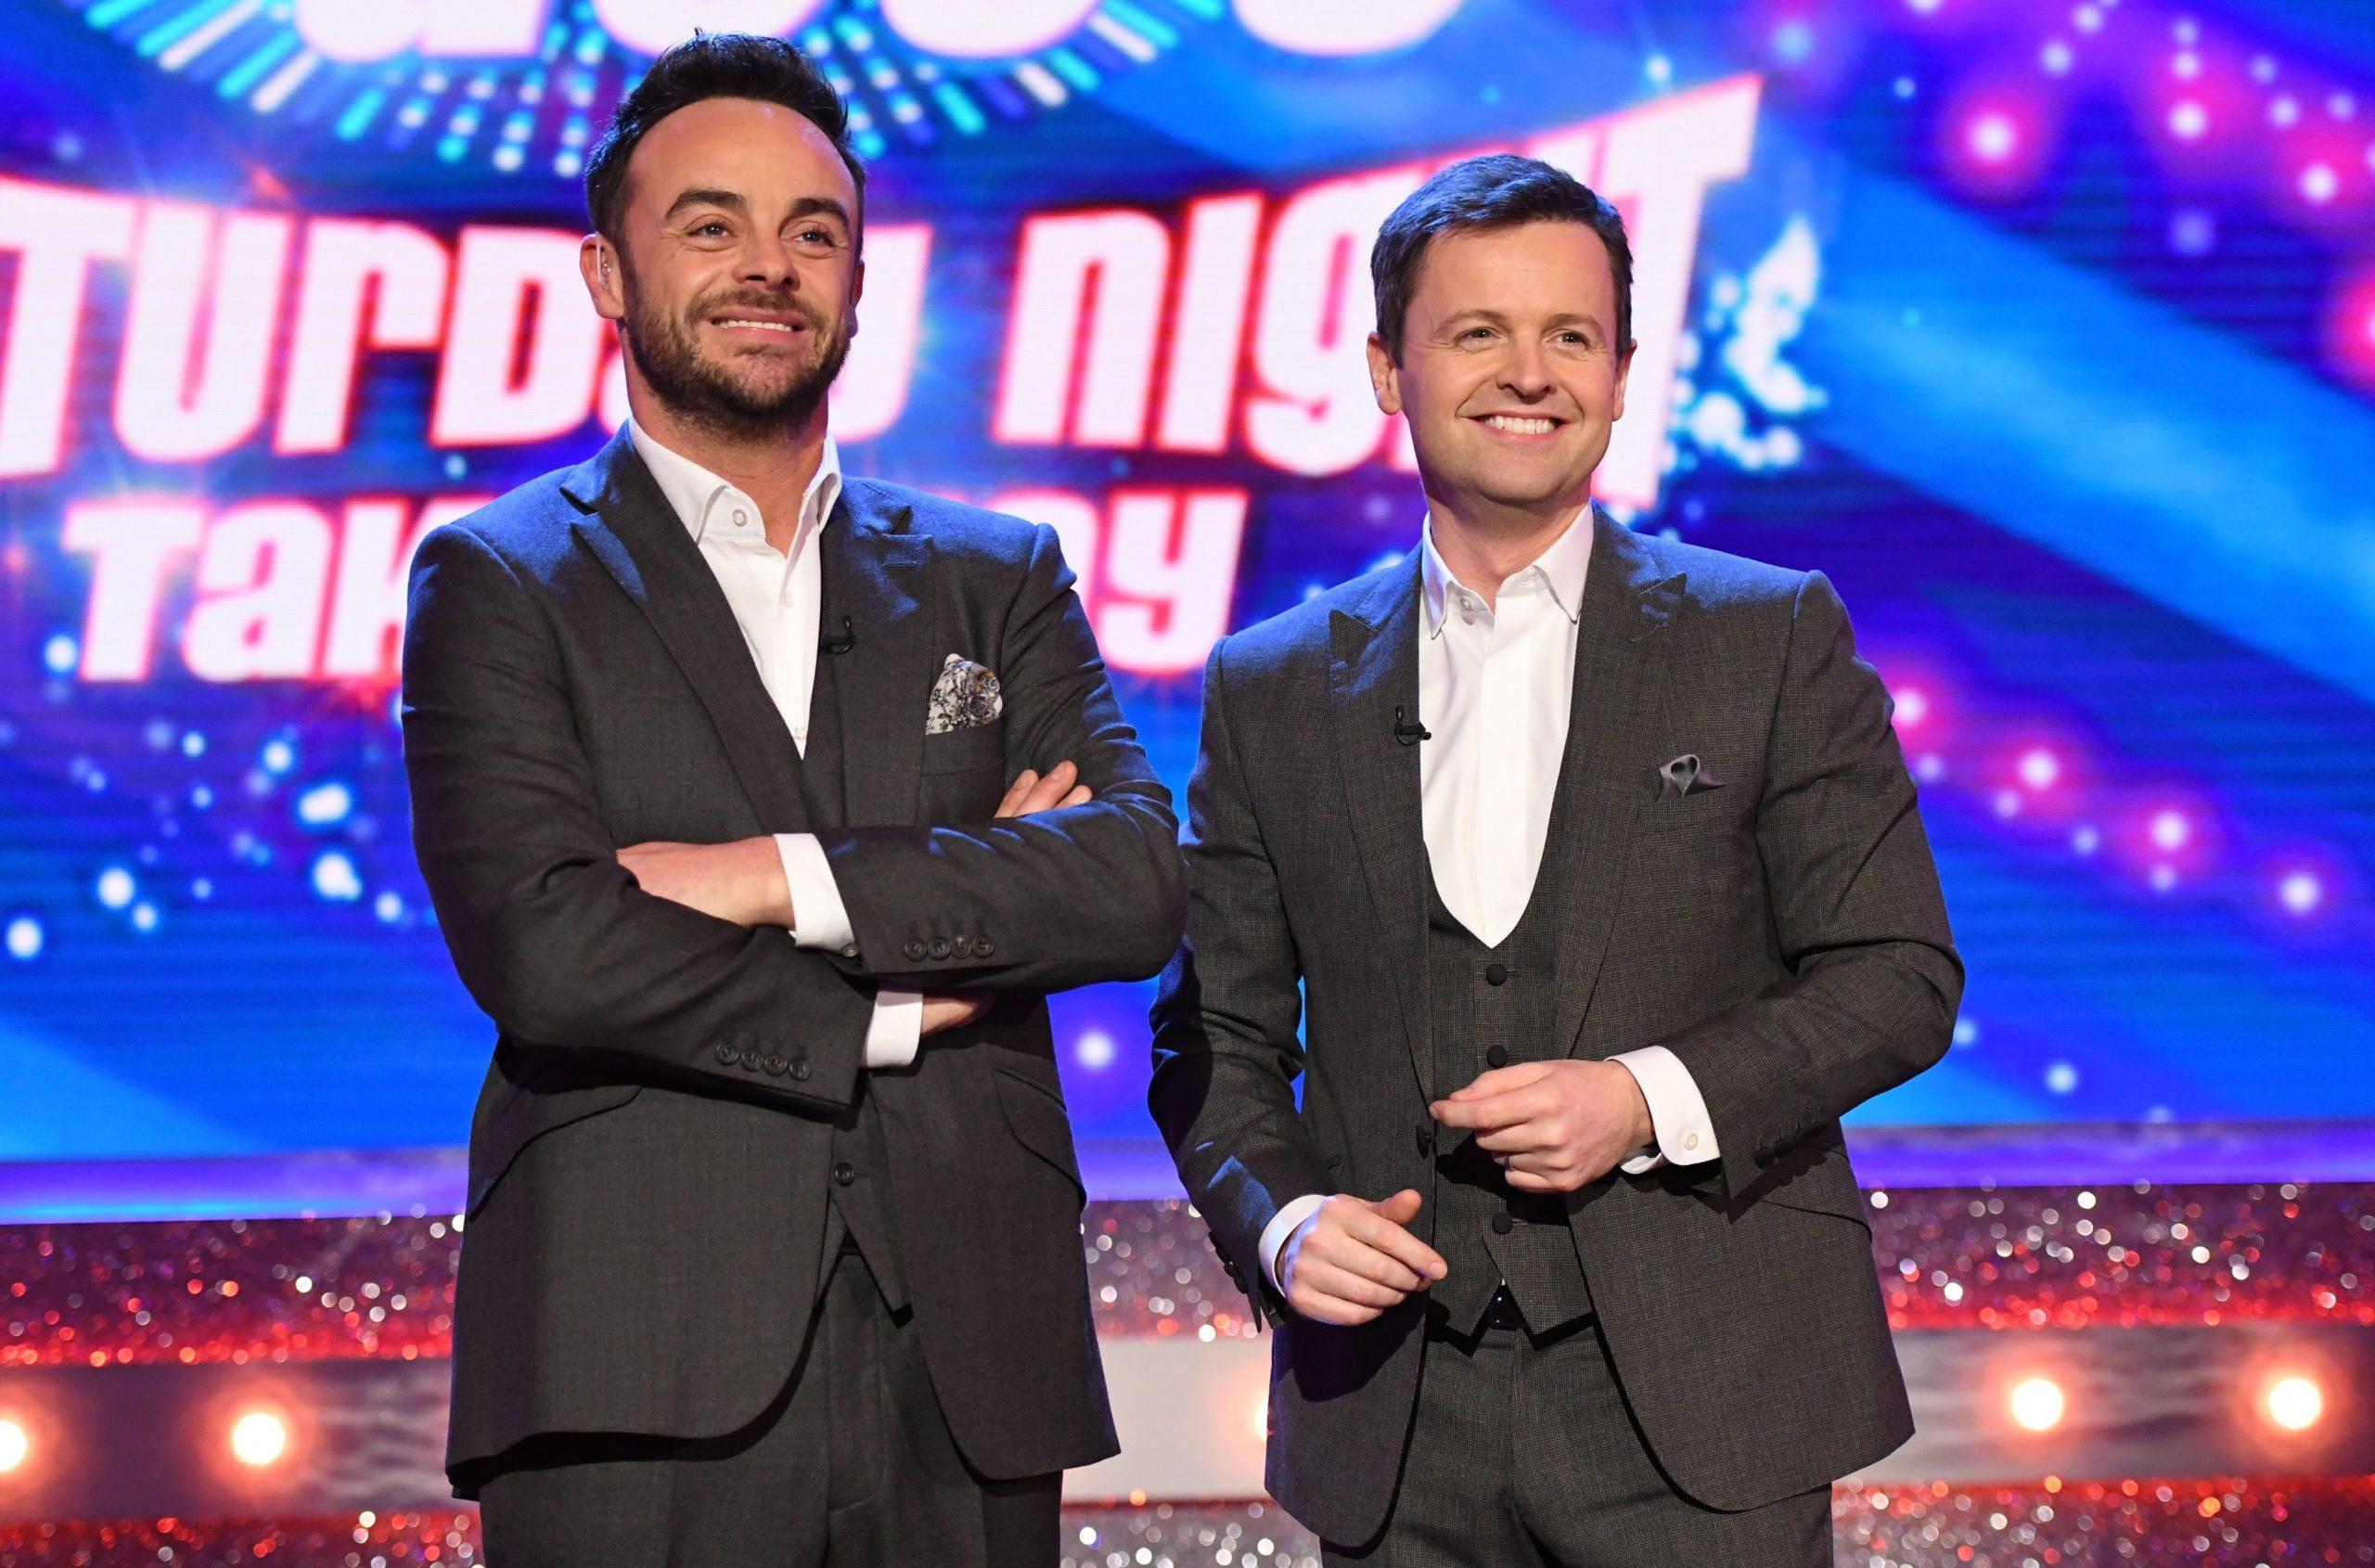 National Lottery Restores ITV Primetime Coverage